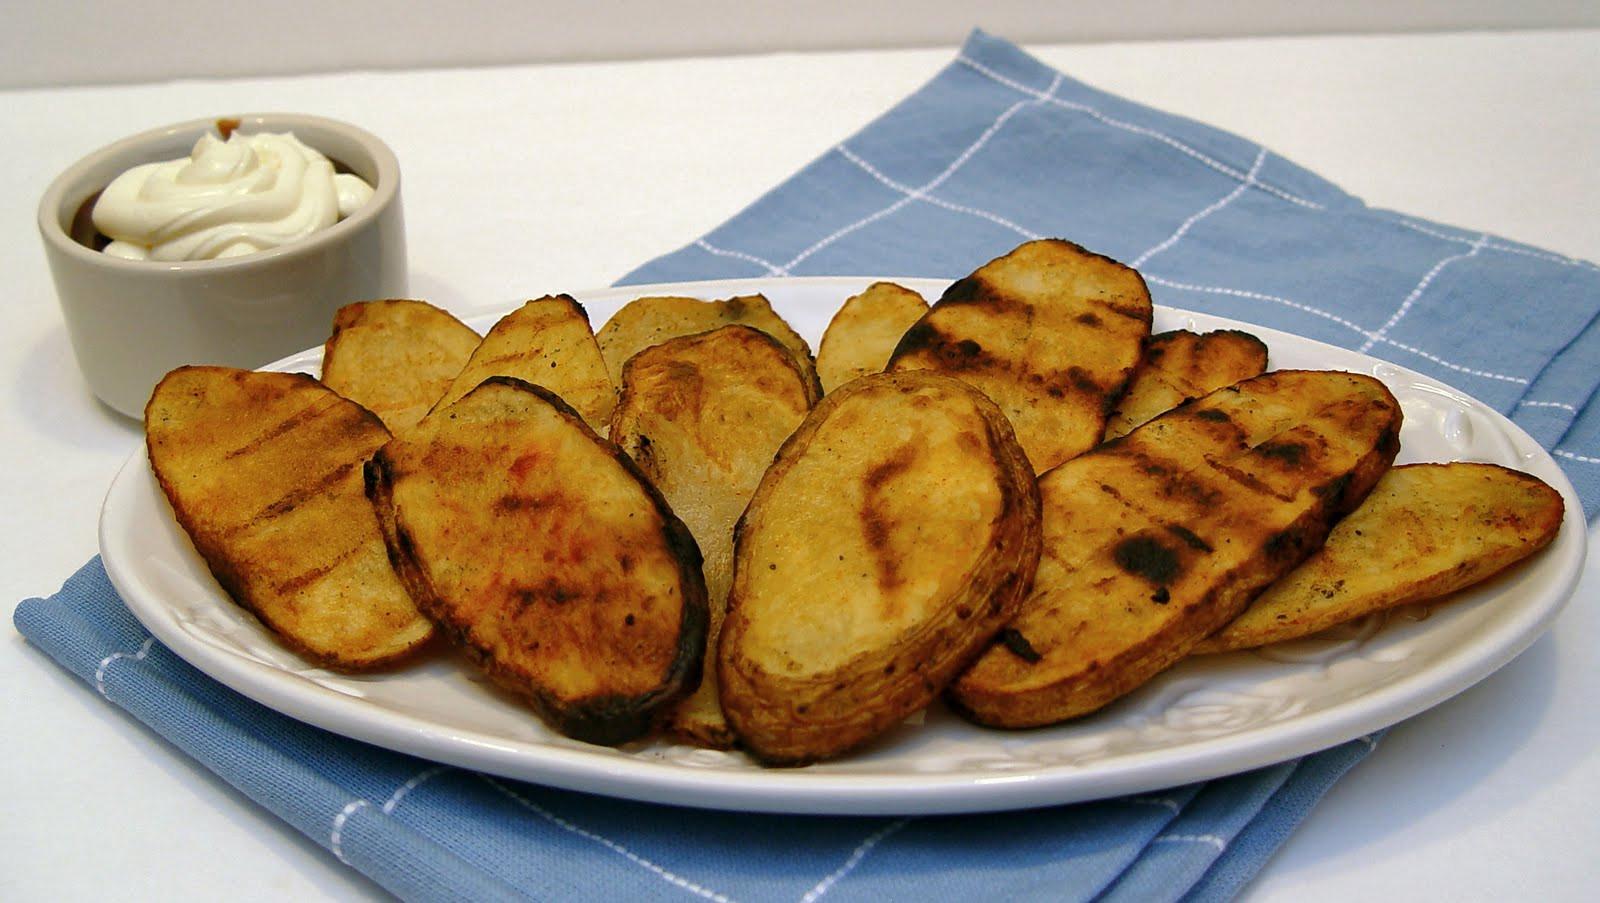 Russet Potato Recipes  Grilled Russet Potatoes